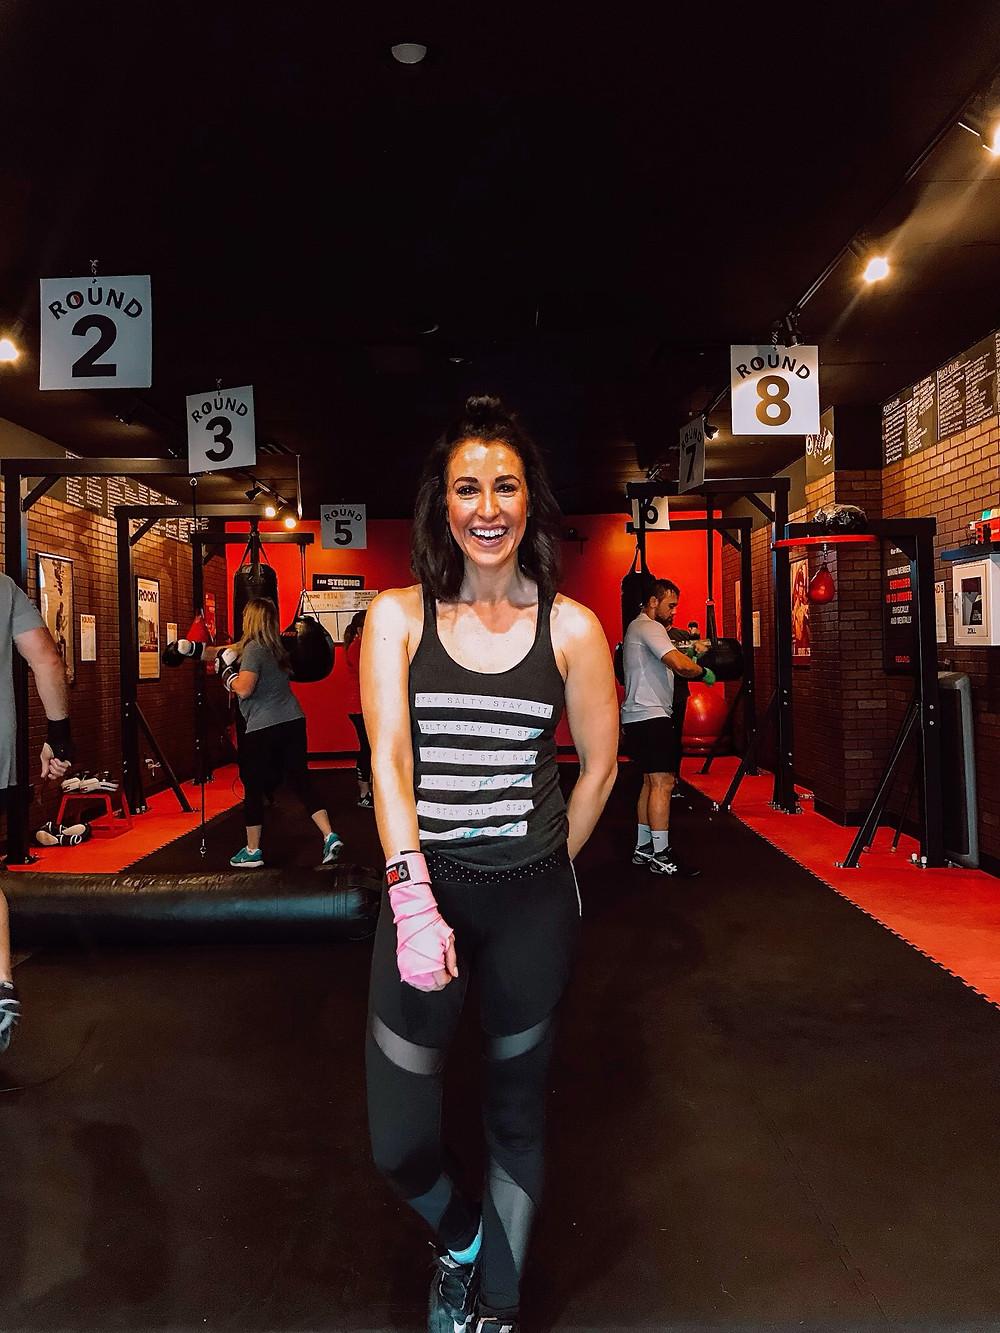 kickboxing, fitness, workout video, 9Round, kickboxing fitness